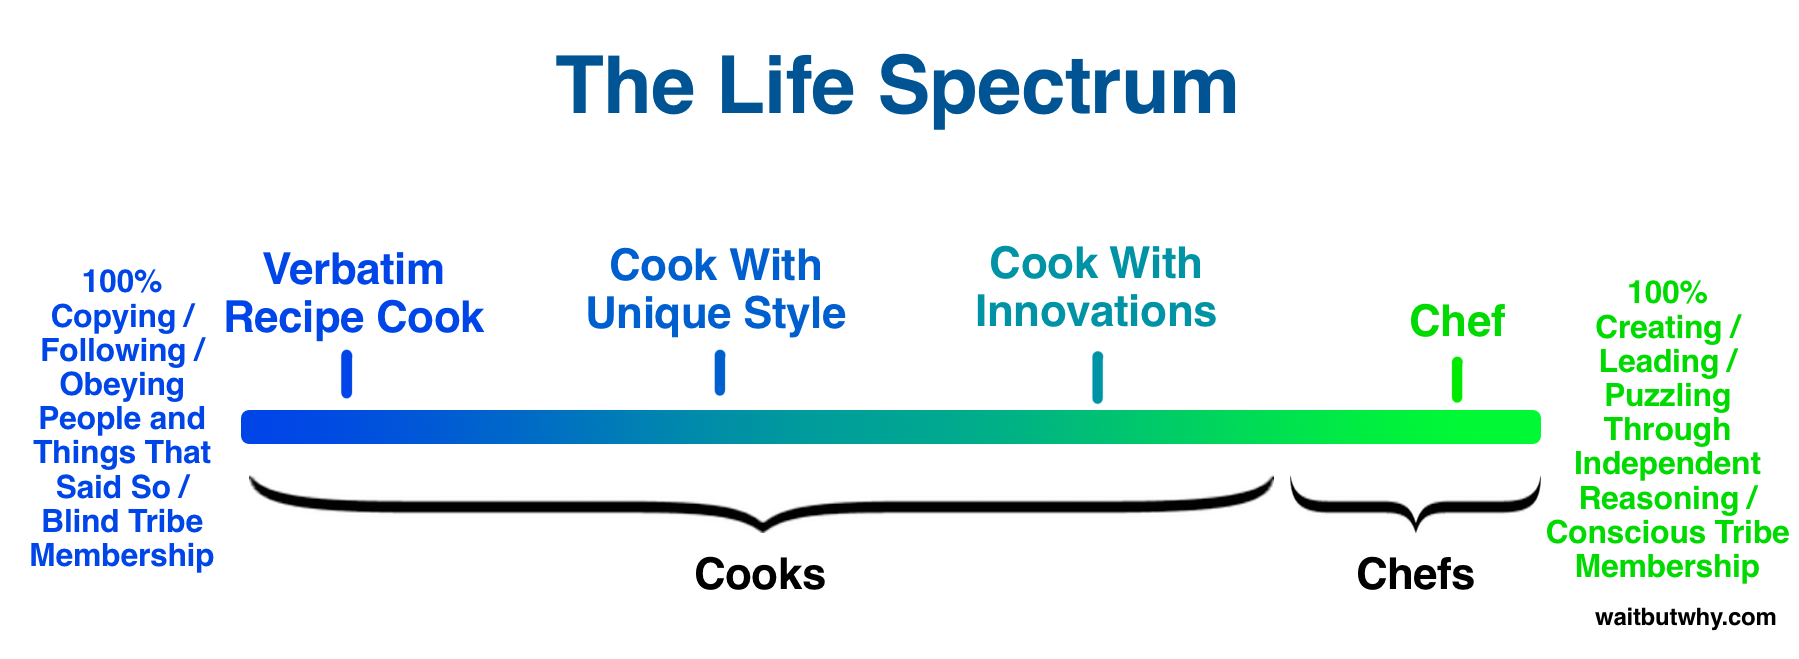 Chef-Cook Life Spectrum